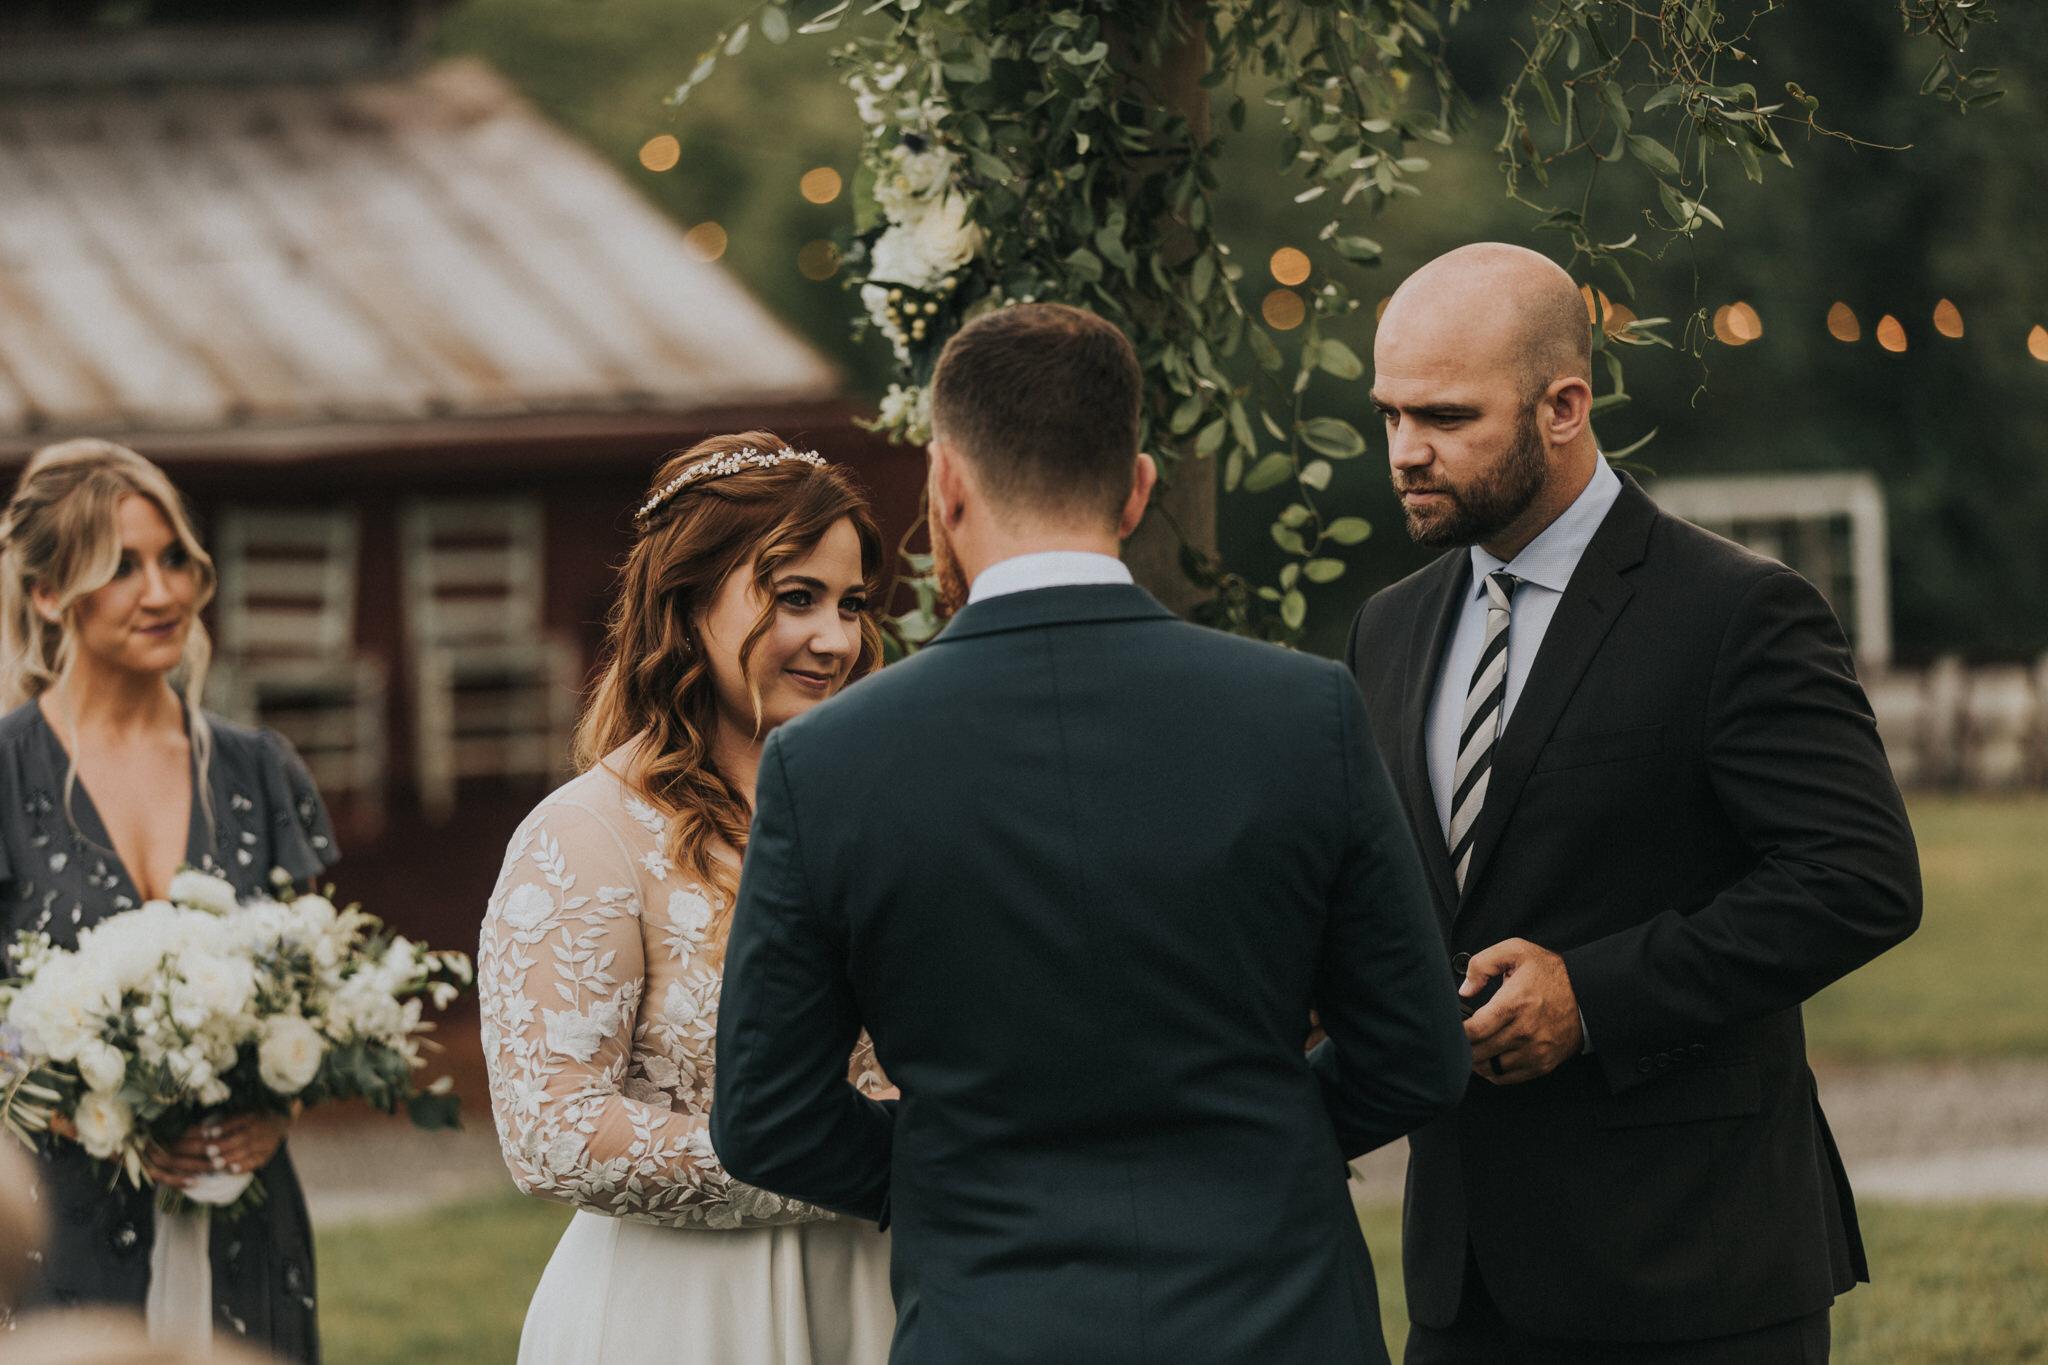 KateMatt-North-Georgia-Wedding-Photographer-Mountain-Laurel-Farm-106.jpg